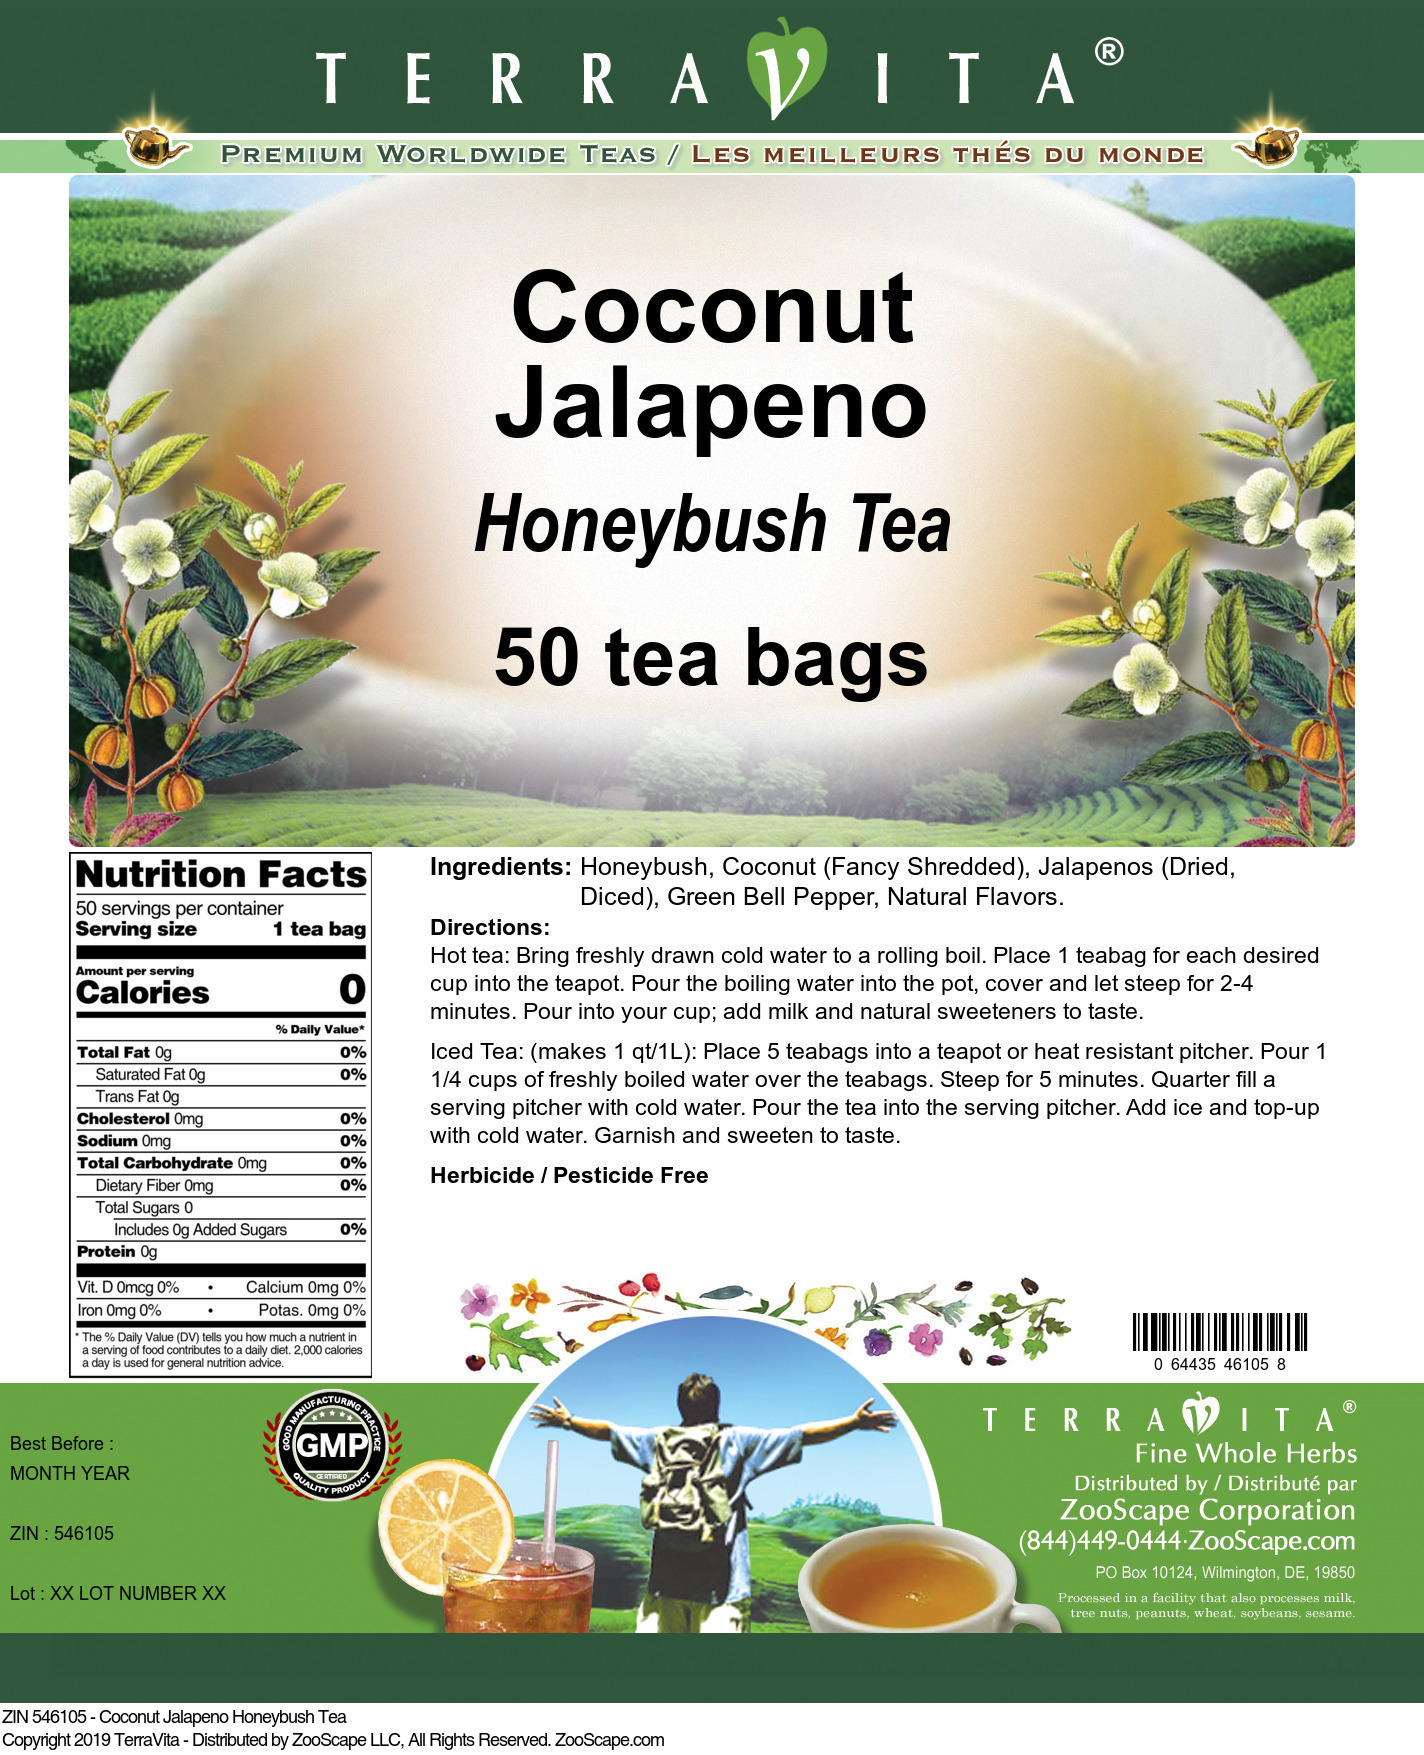 Coconut Jalapeno Honeybush Tea